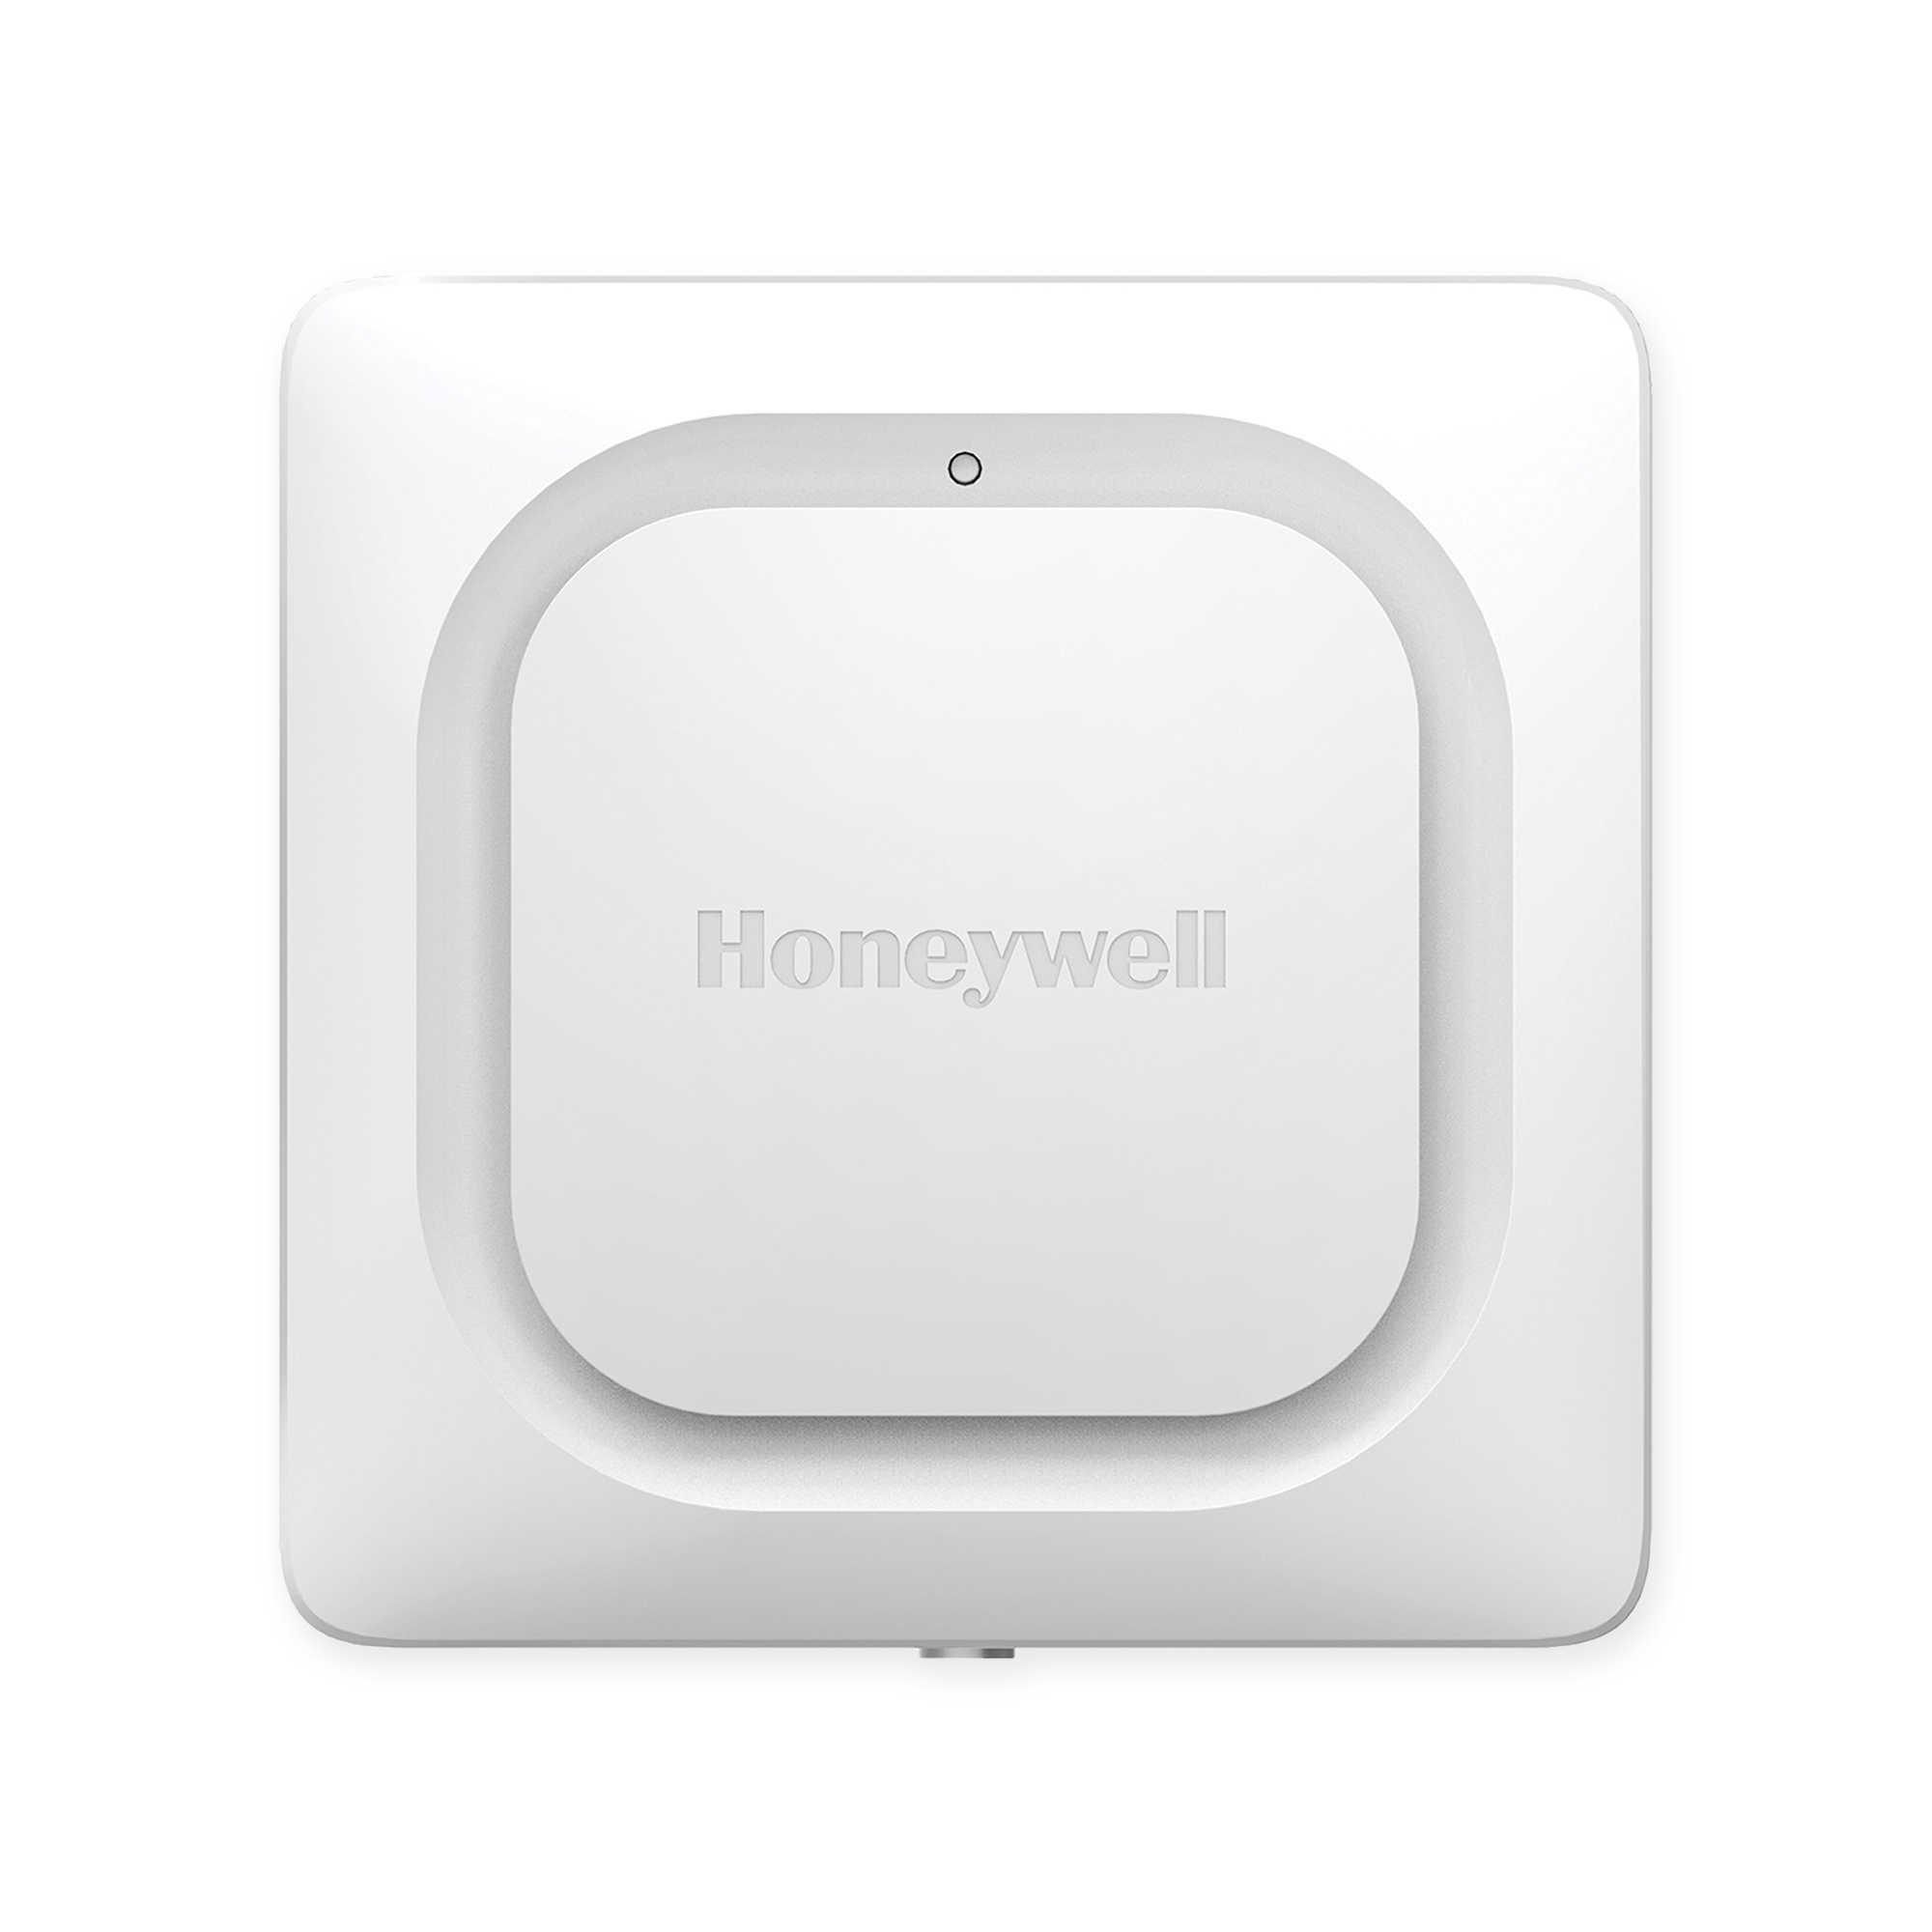 honeywell leak detector